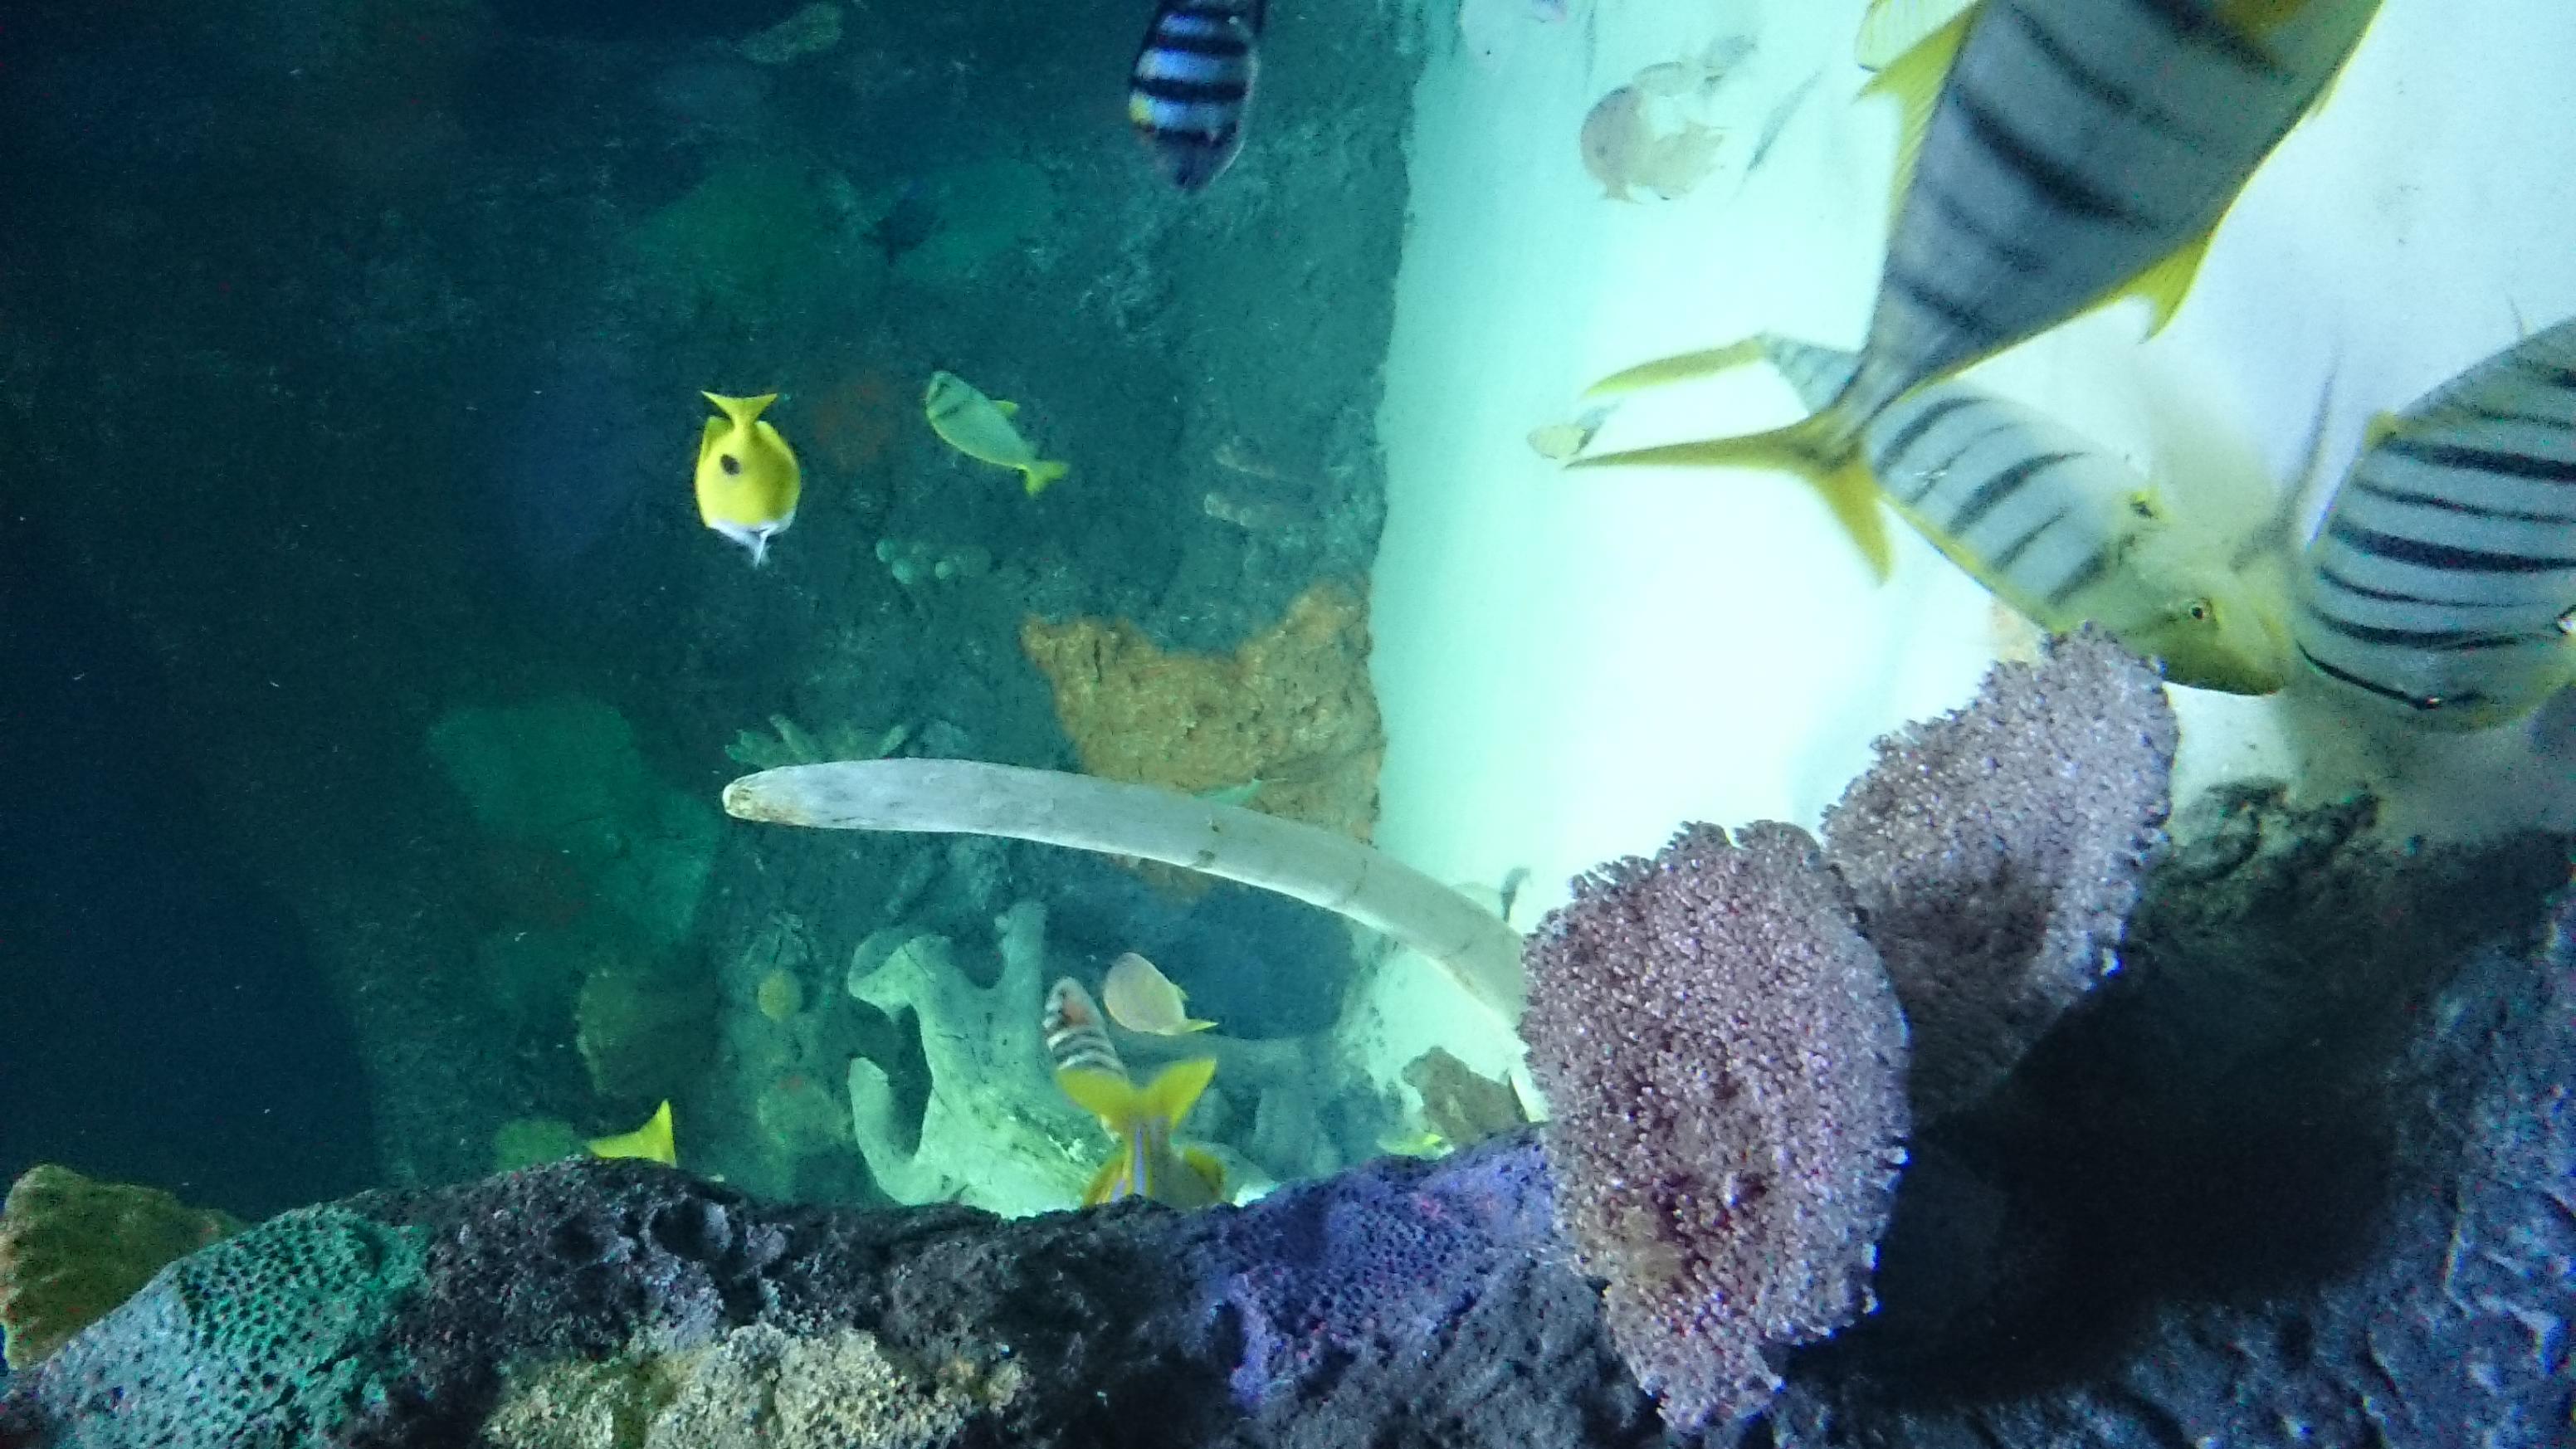 Freshwater fish kansas city - Kansas City Sealife Aquarium